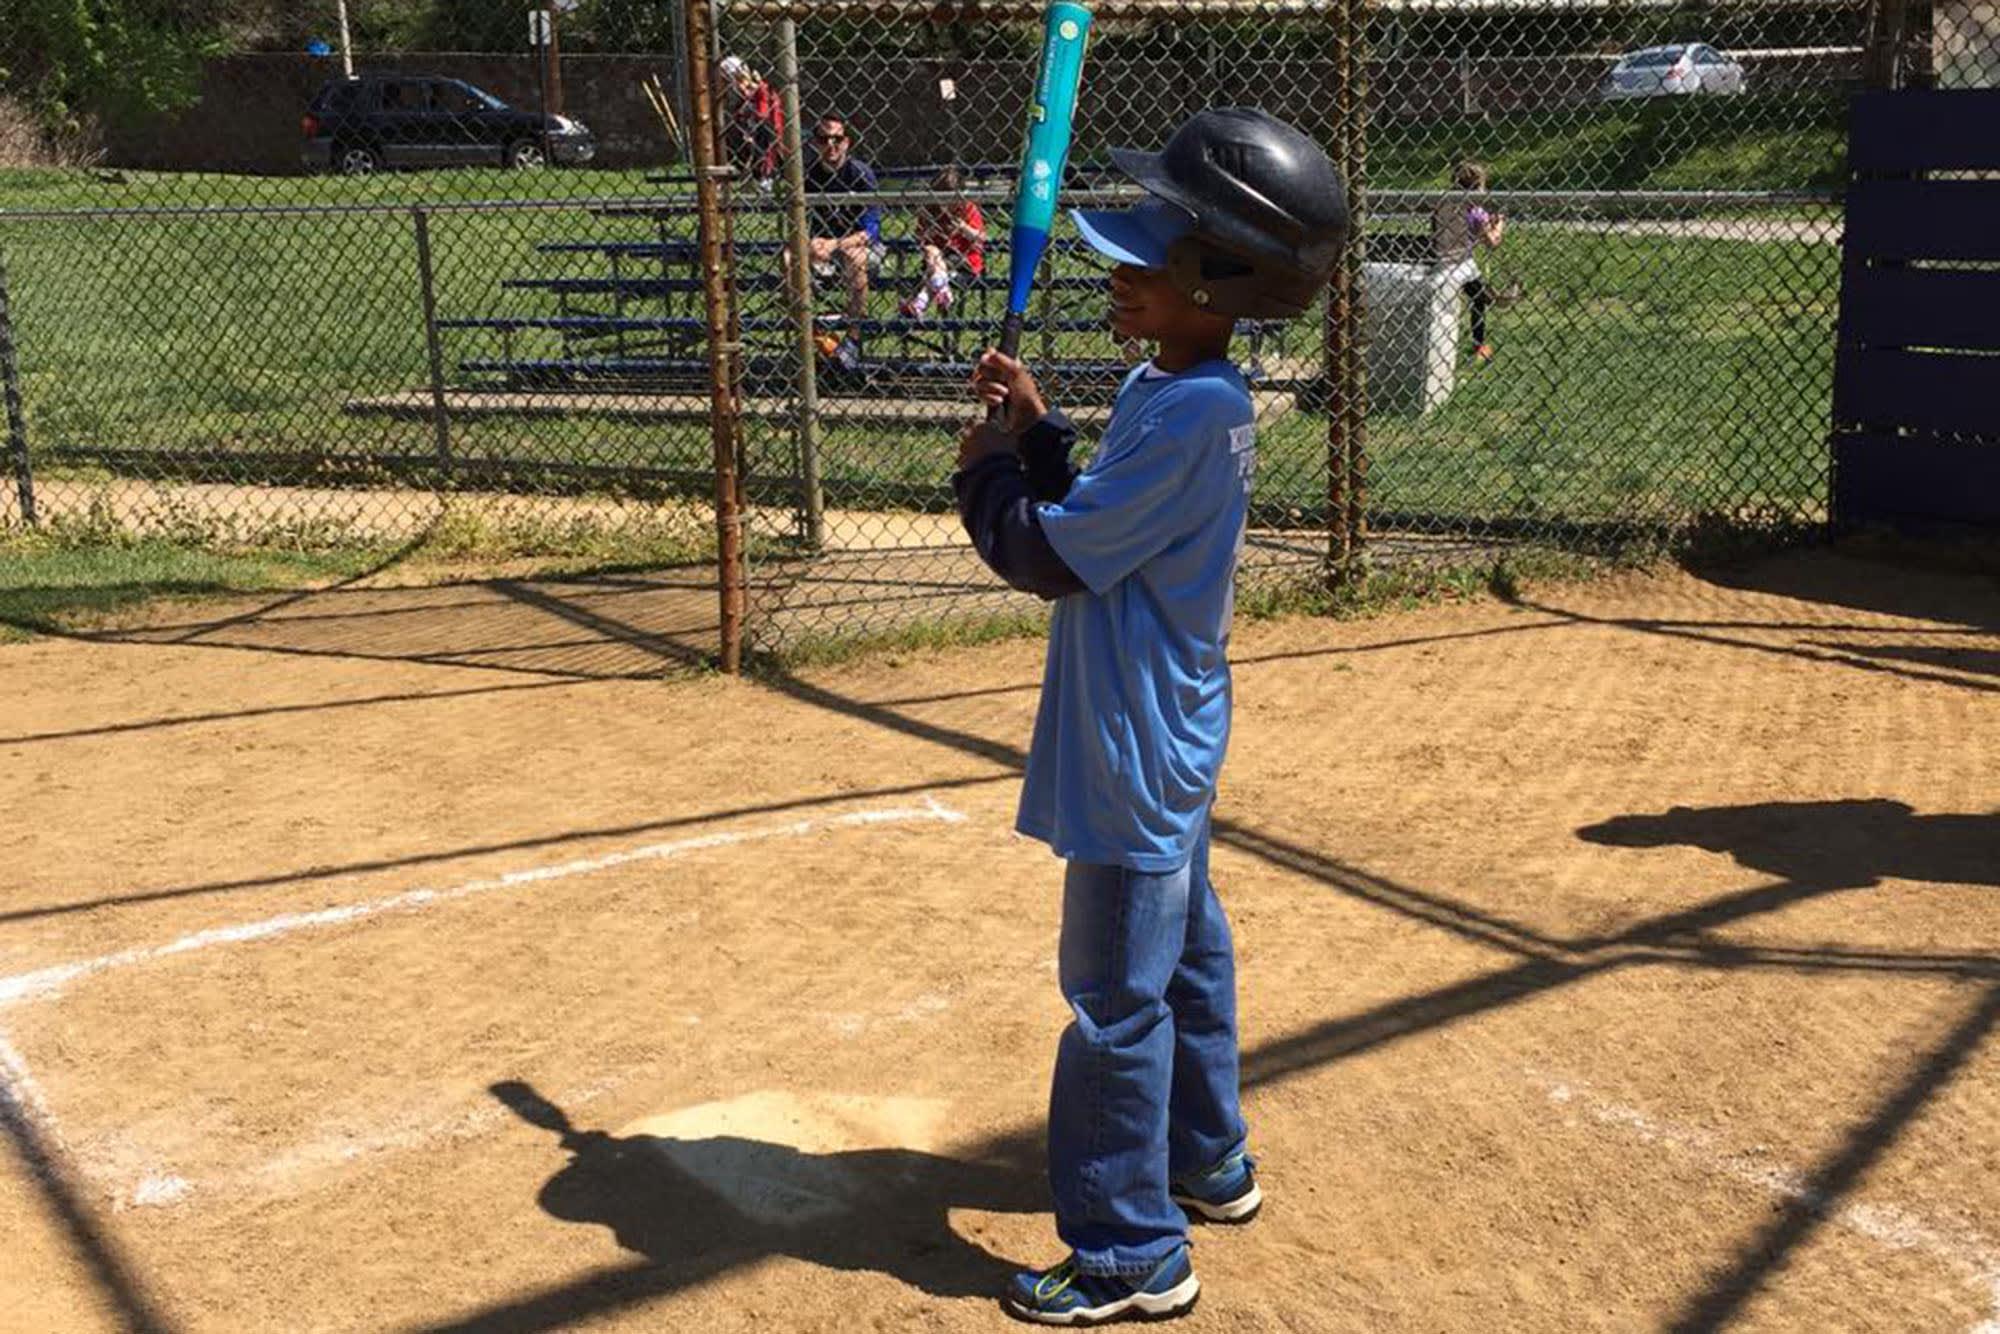 Cheltenham (Pa.) Little League player ready to bat